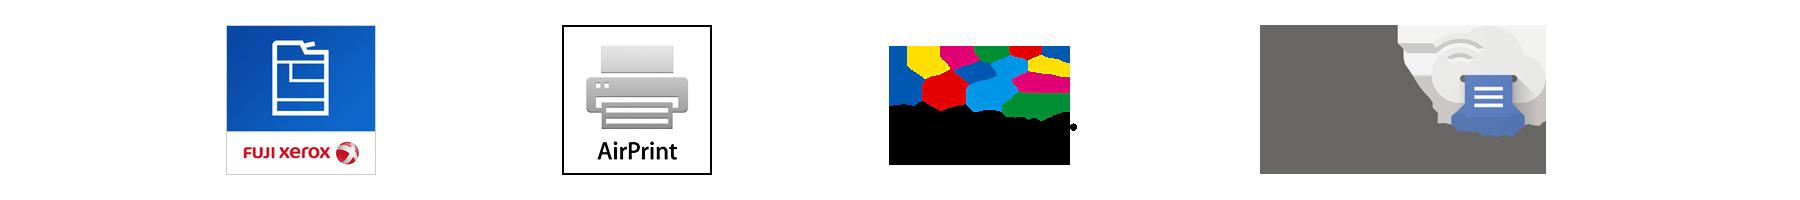 Print Utility / AirPrint / Google Cloud Print / Mopria Print Service Logo